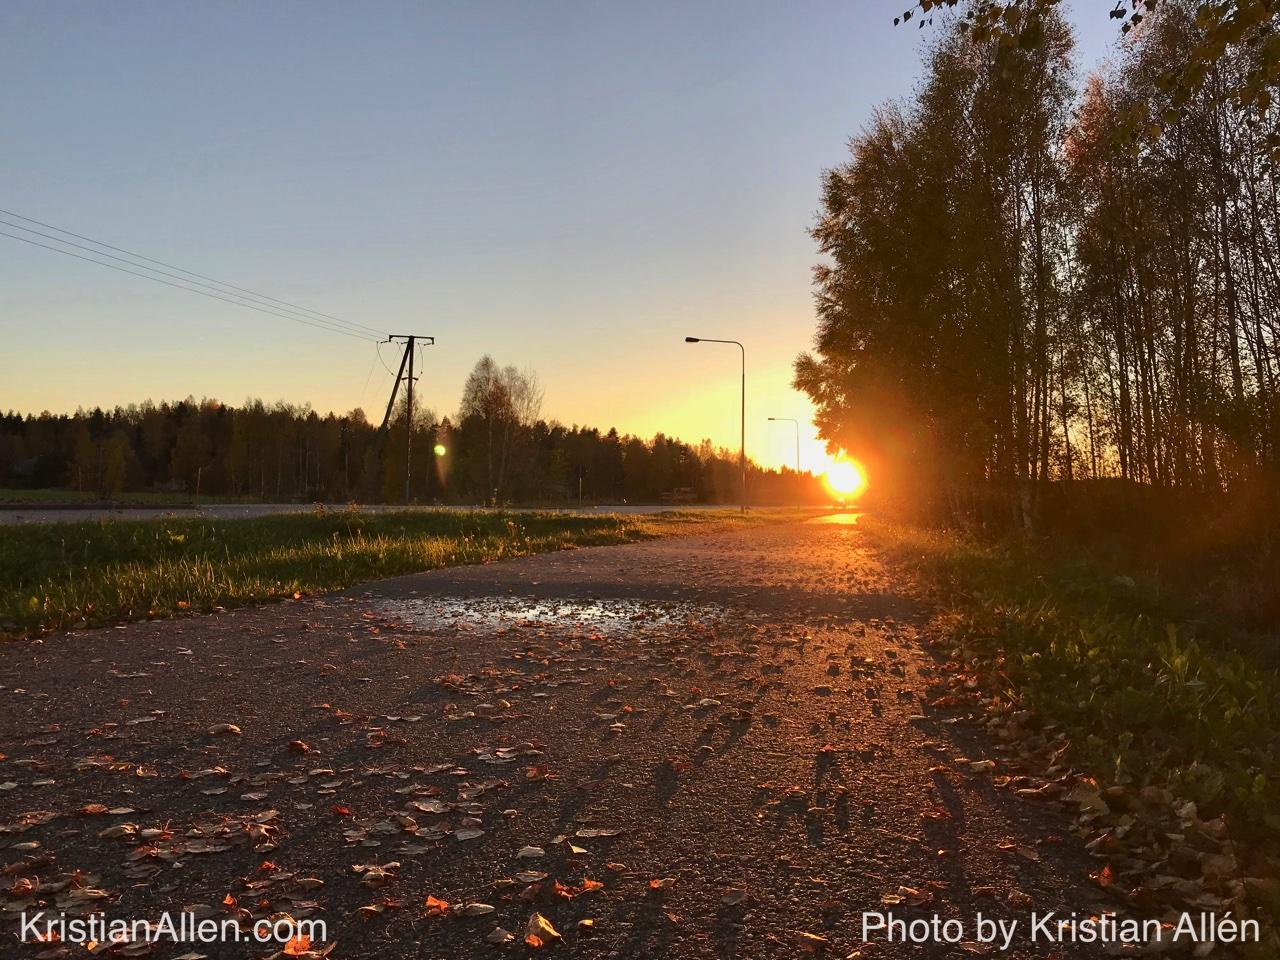 16.10.2017 15.22 km Run